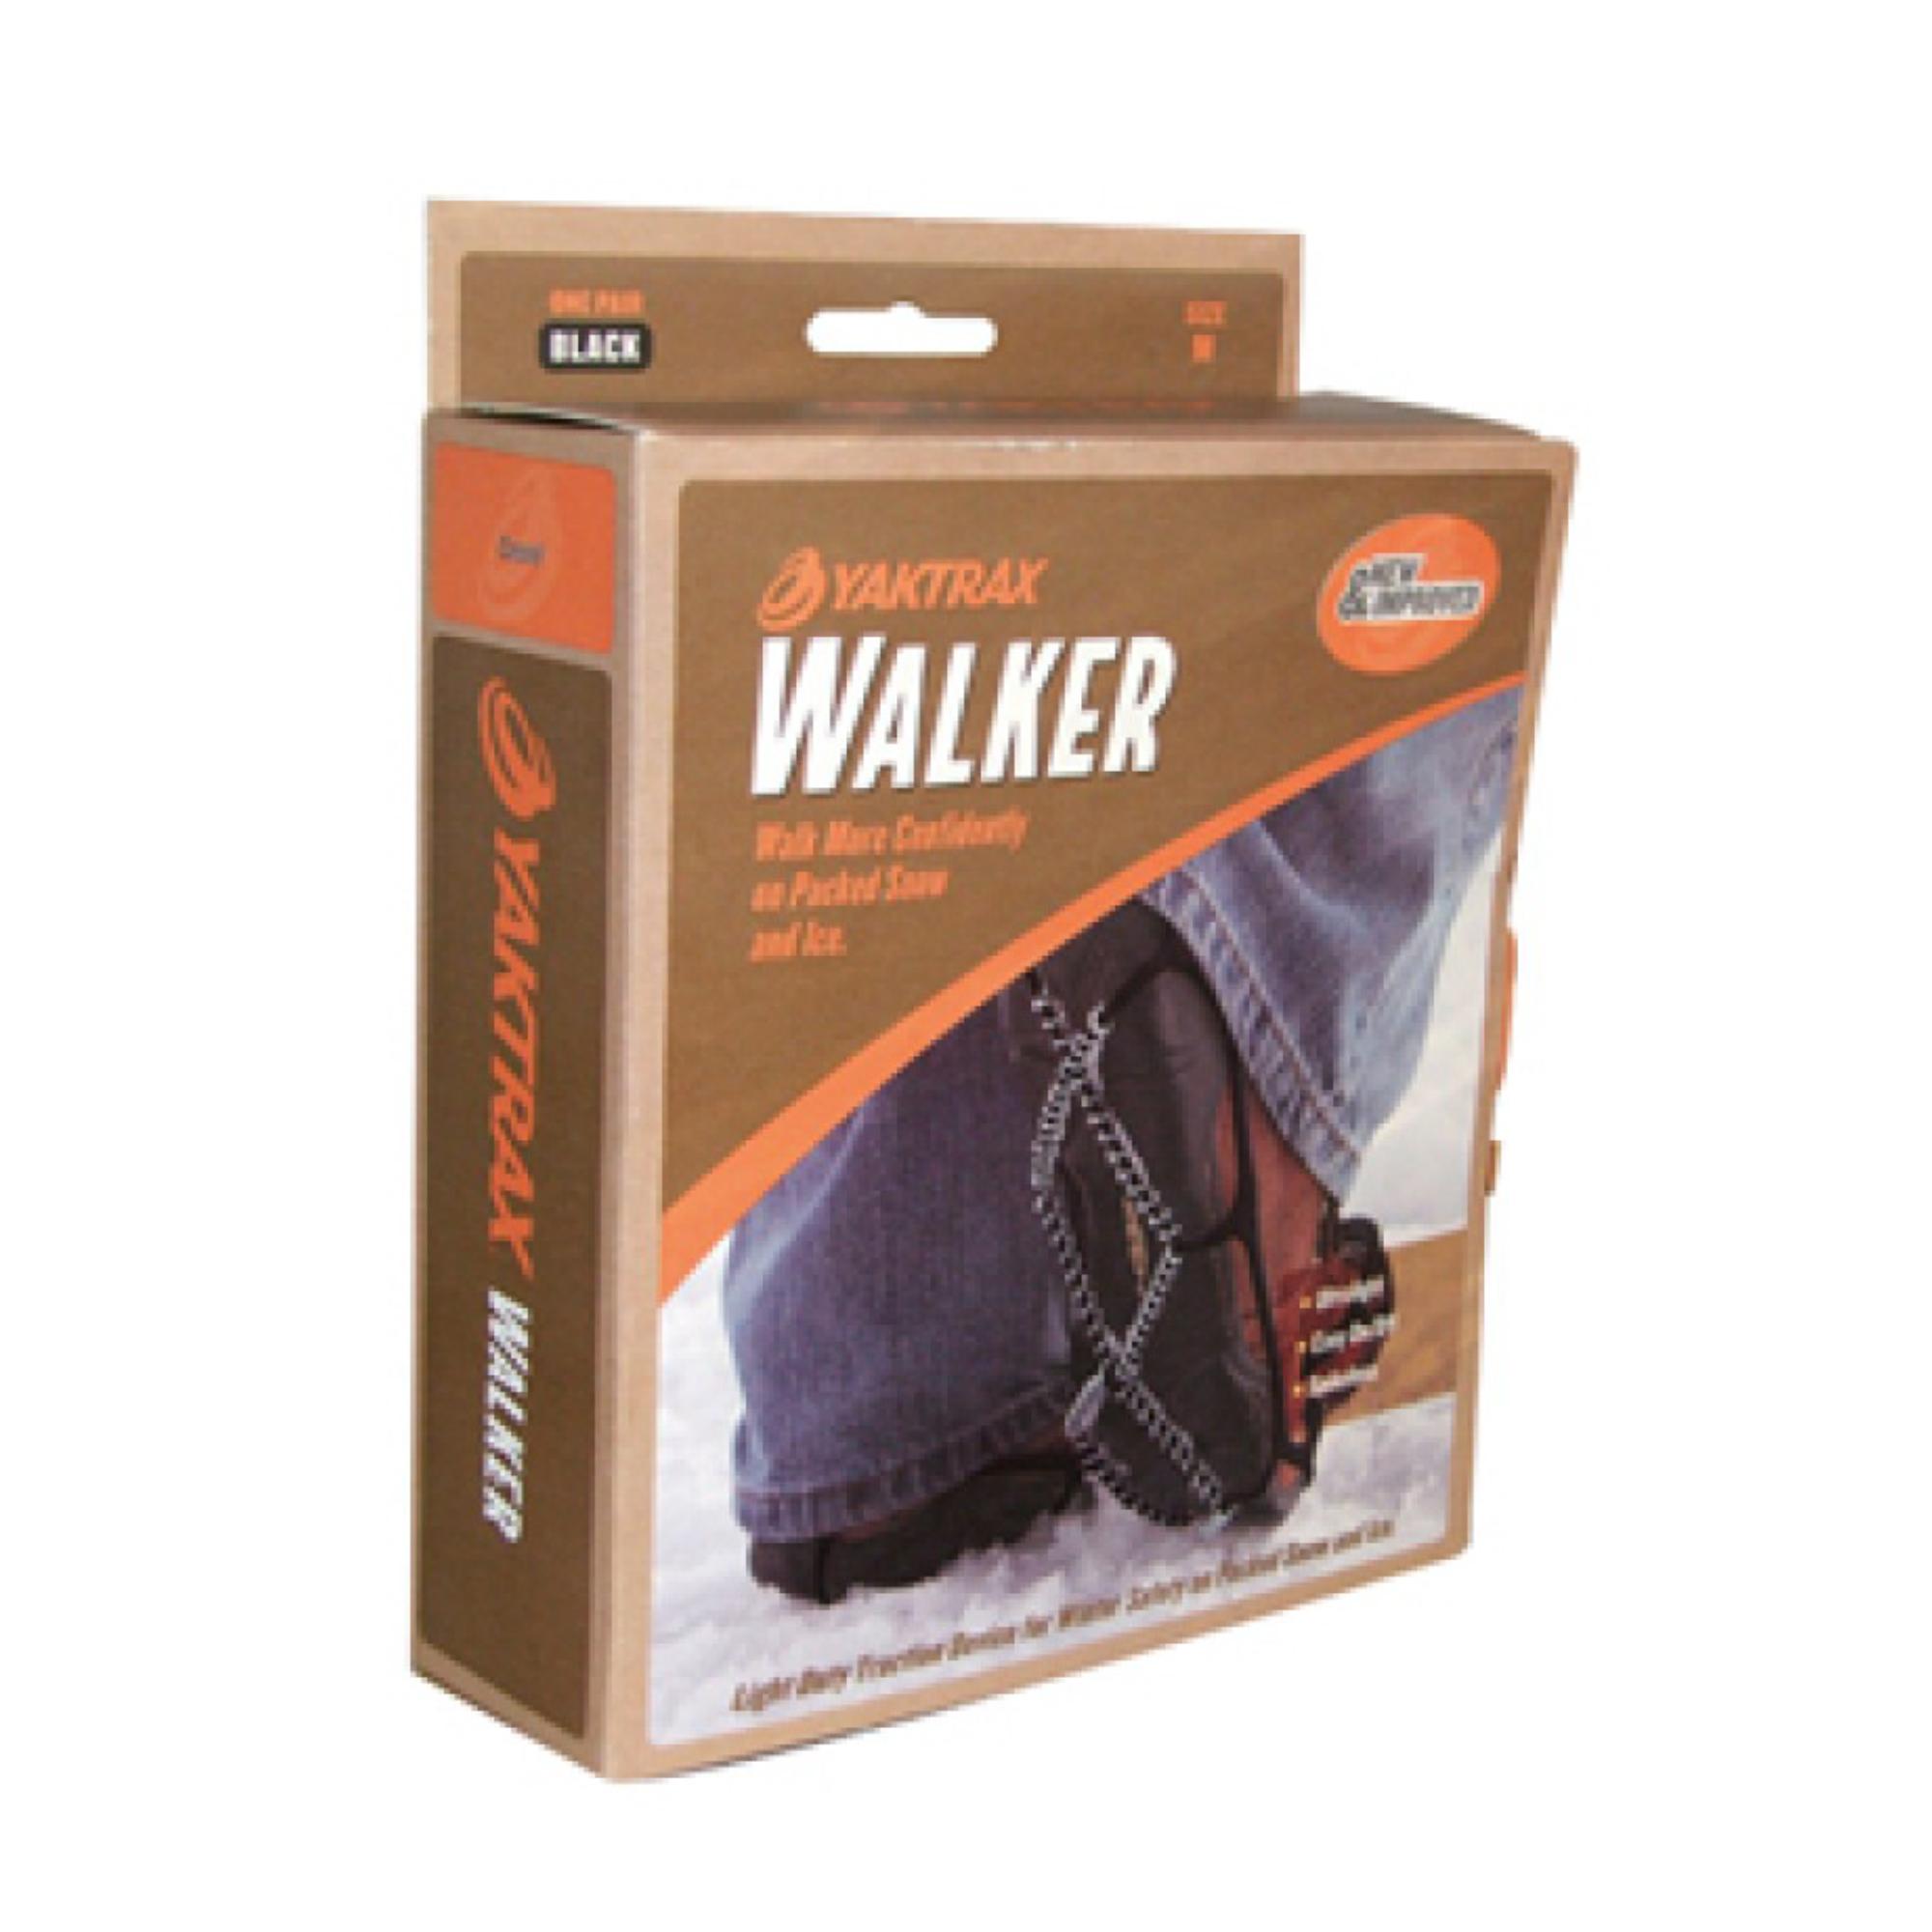 Pedag Yaktrax Walker 81087300 Sneeuwkettingen